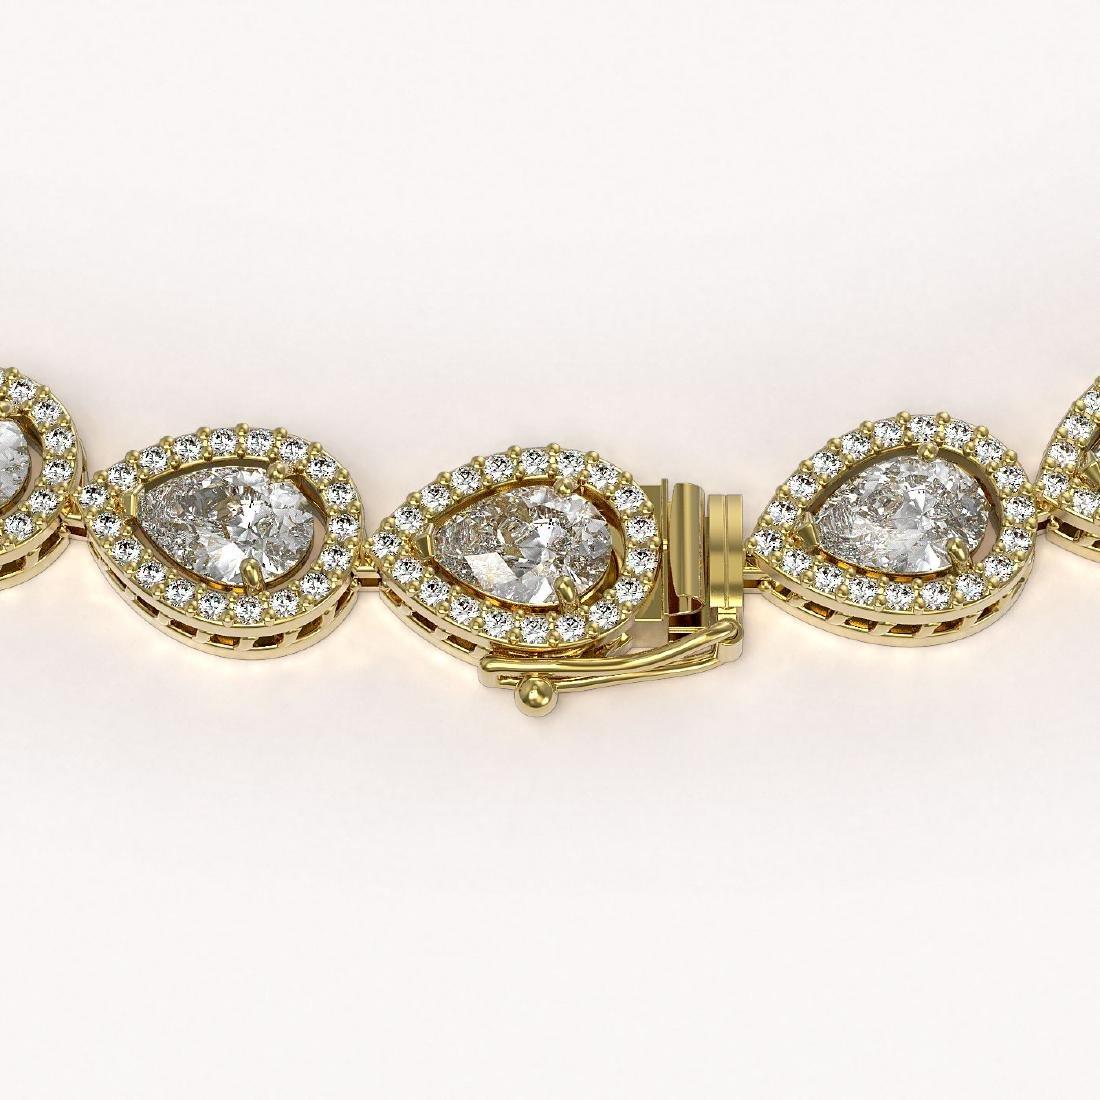 28.74 CTW Pear Diamond Designer Necklace 18K Yellow - 3